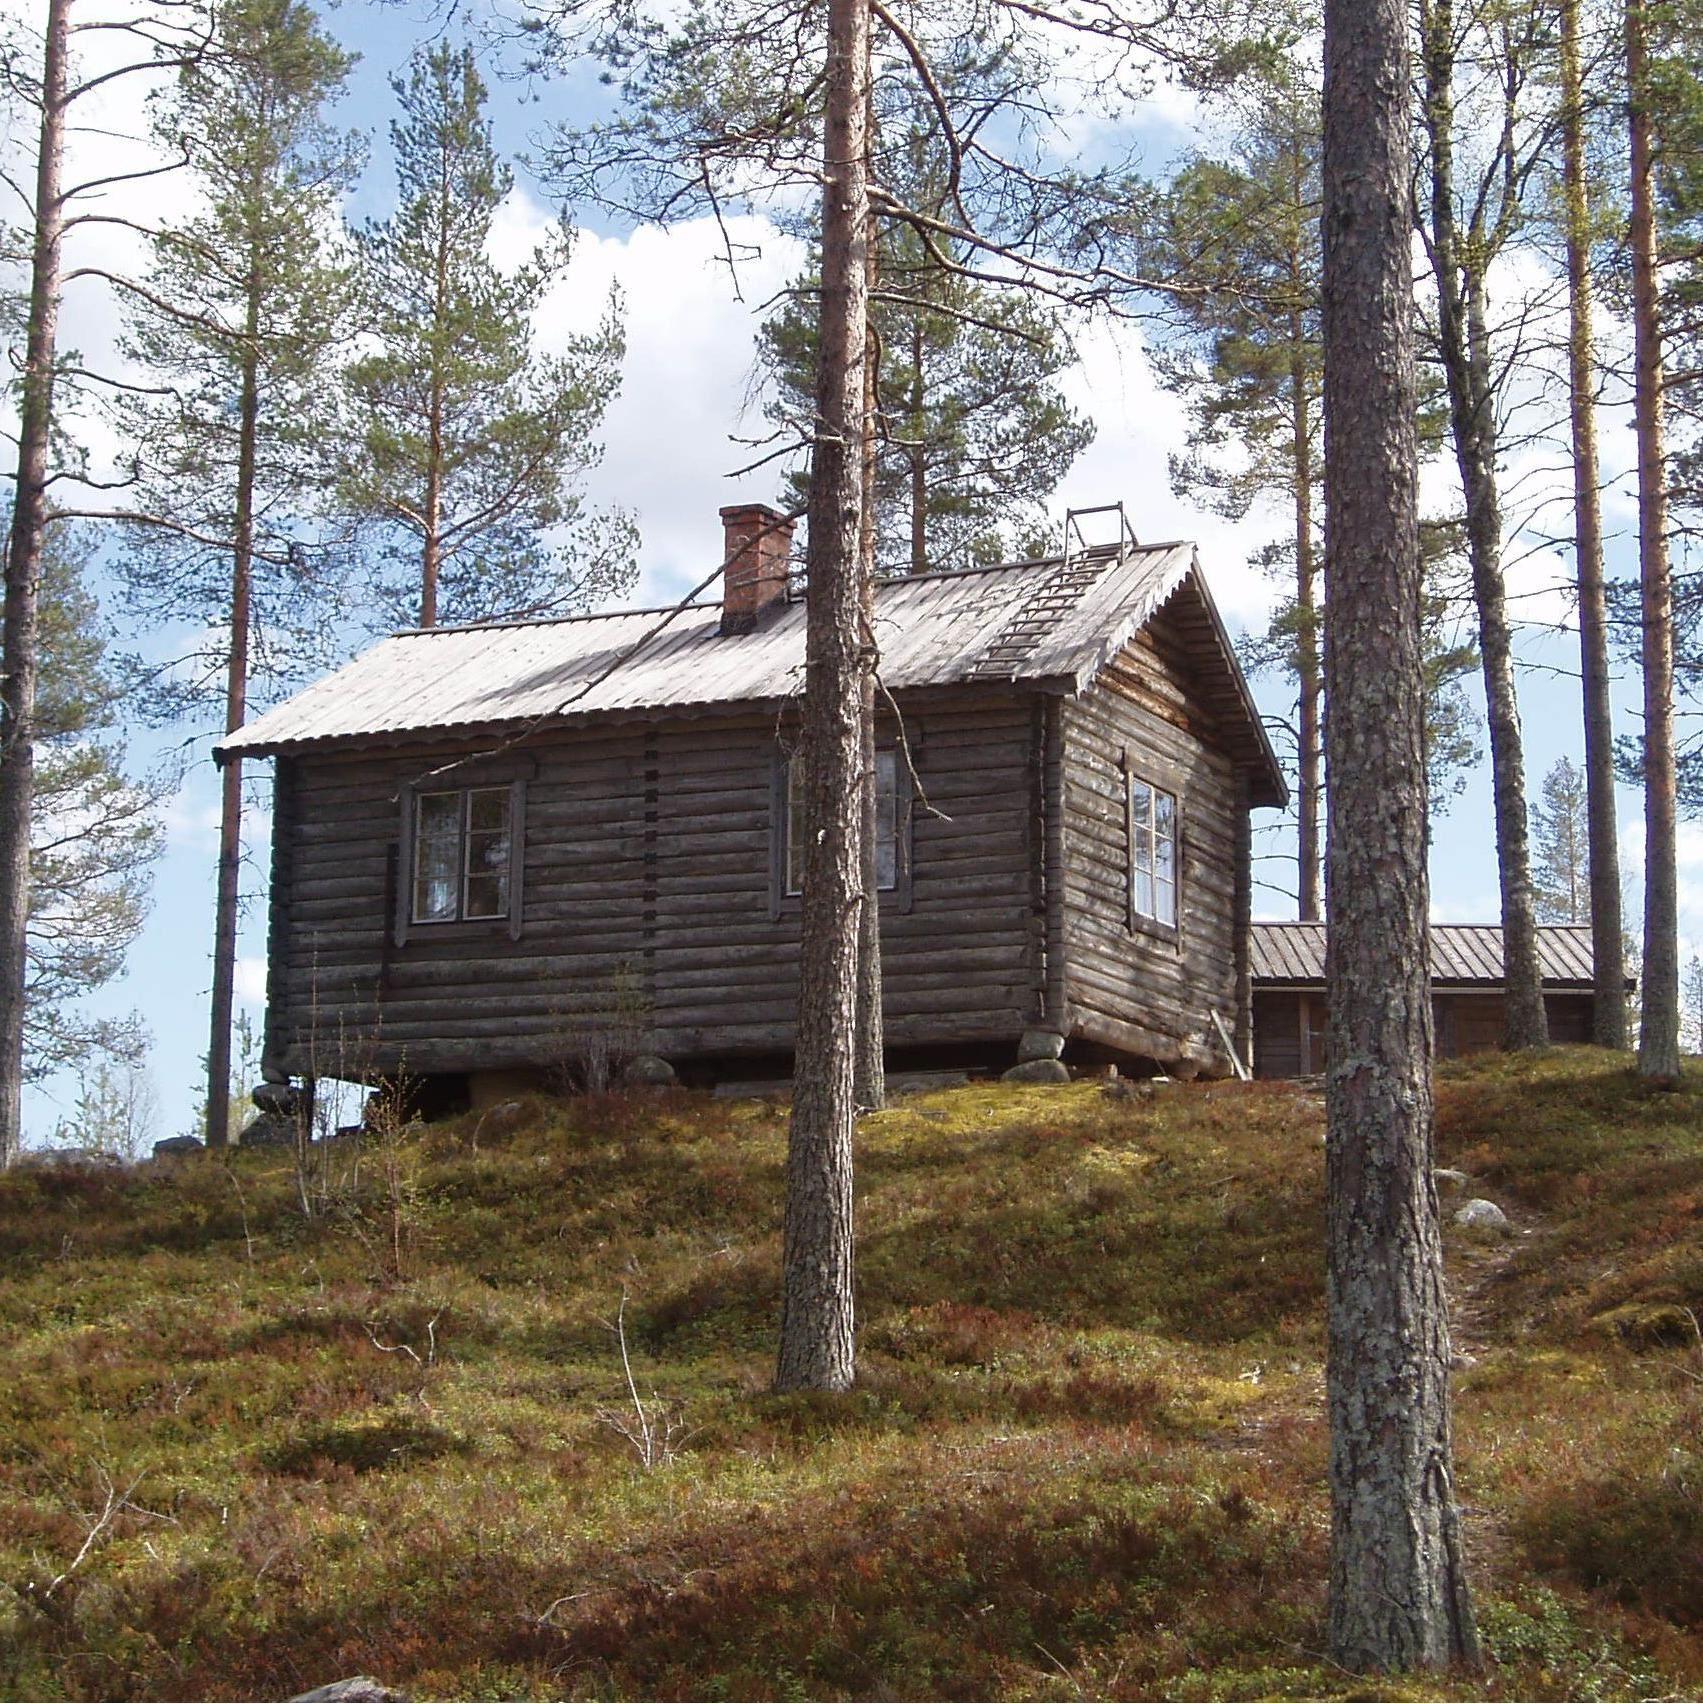 Lena Liljemark,  © Lena Liljemark, Skinnenstugan, raststuga i Lögdö vildmark